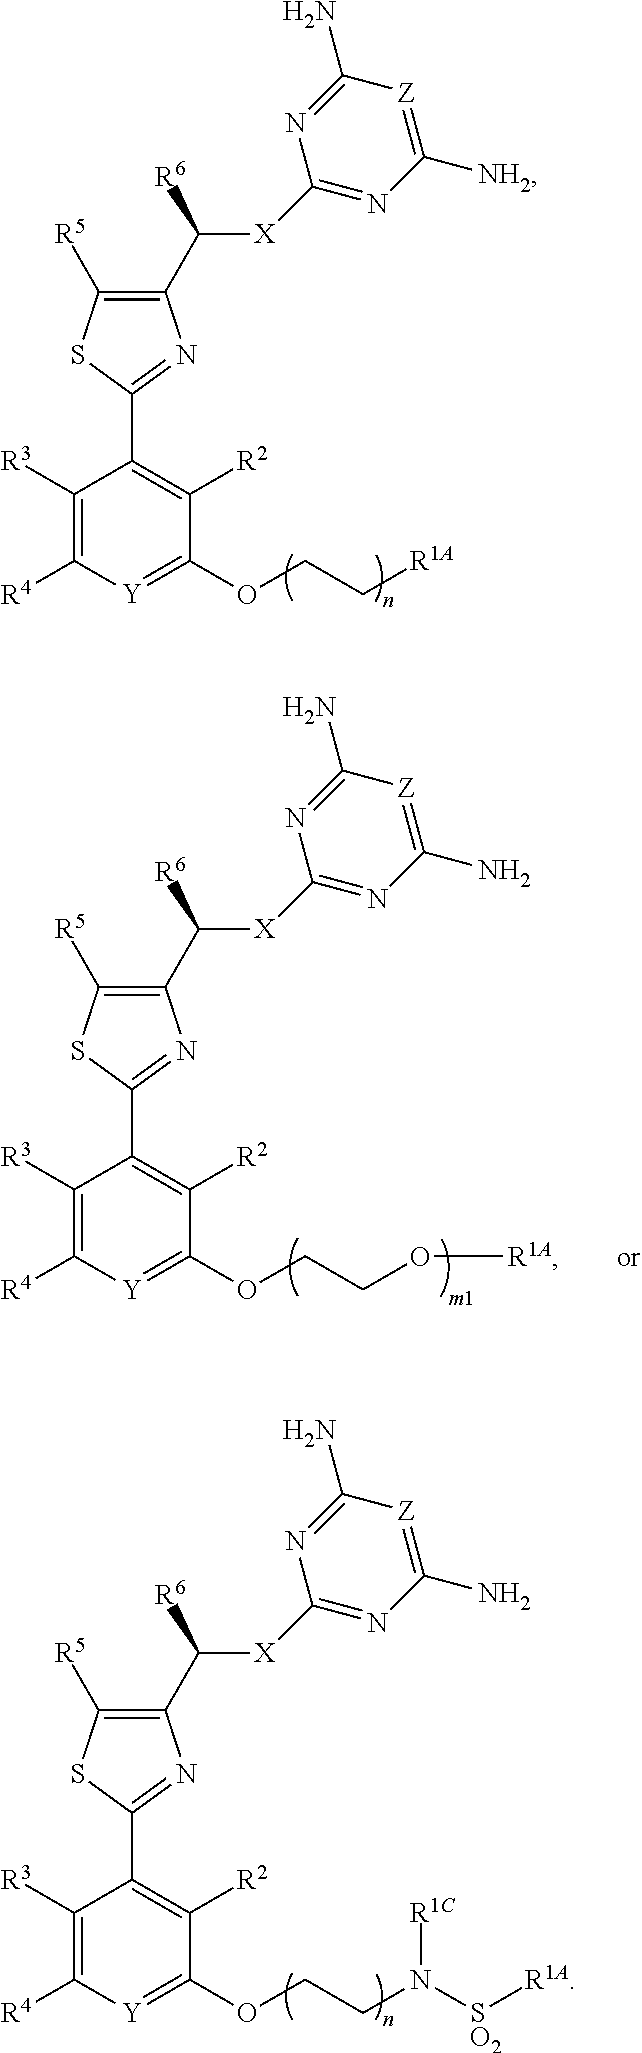 Us9598404b2 Deoxycytidine Kinase Inhibitors Google Patents 1997 Cobra Fuse Box Figure Us09598404 20170321 C00015